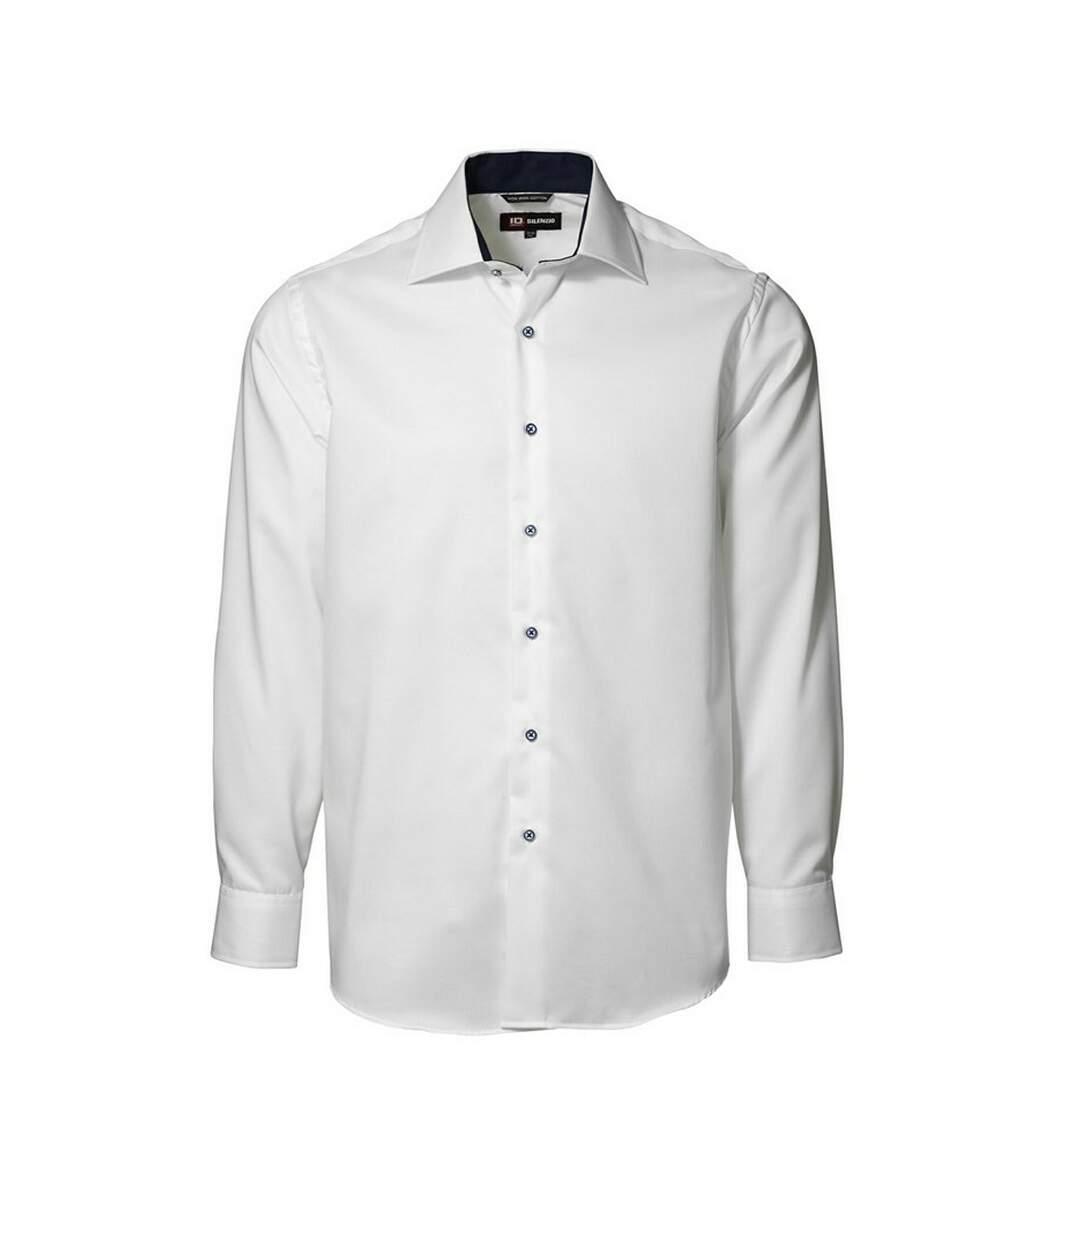 ID Mens Classic Easy Iron Contrast Long Sleeve Regular Fitting Formal Shirt (White) - UTID264